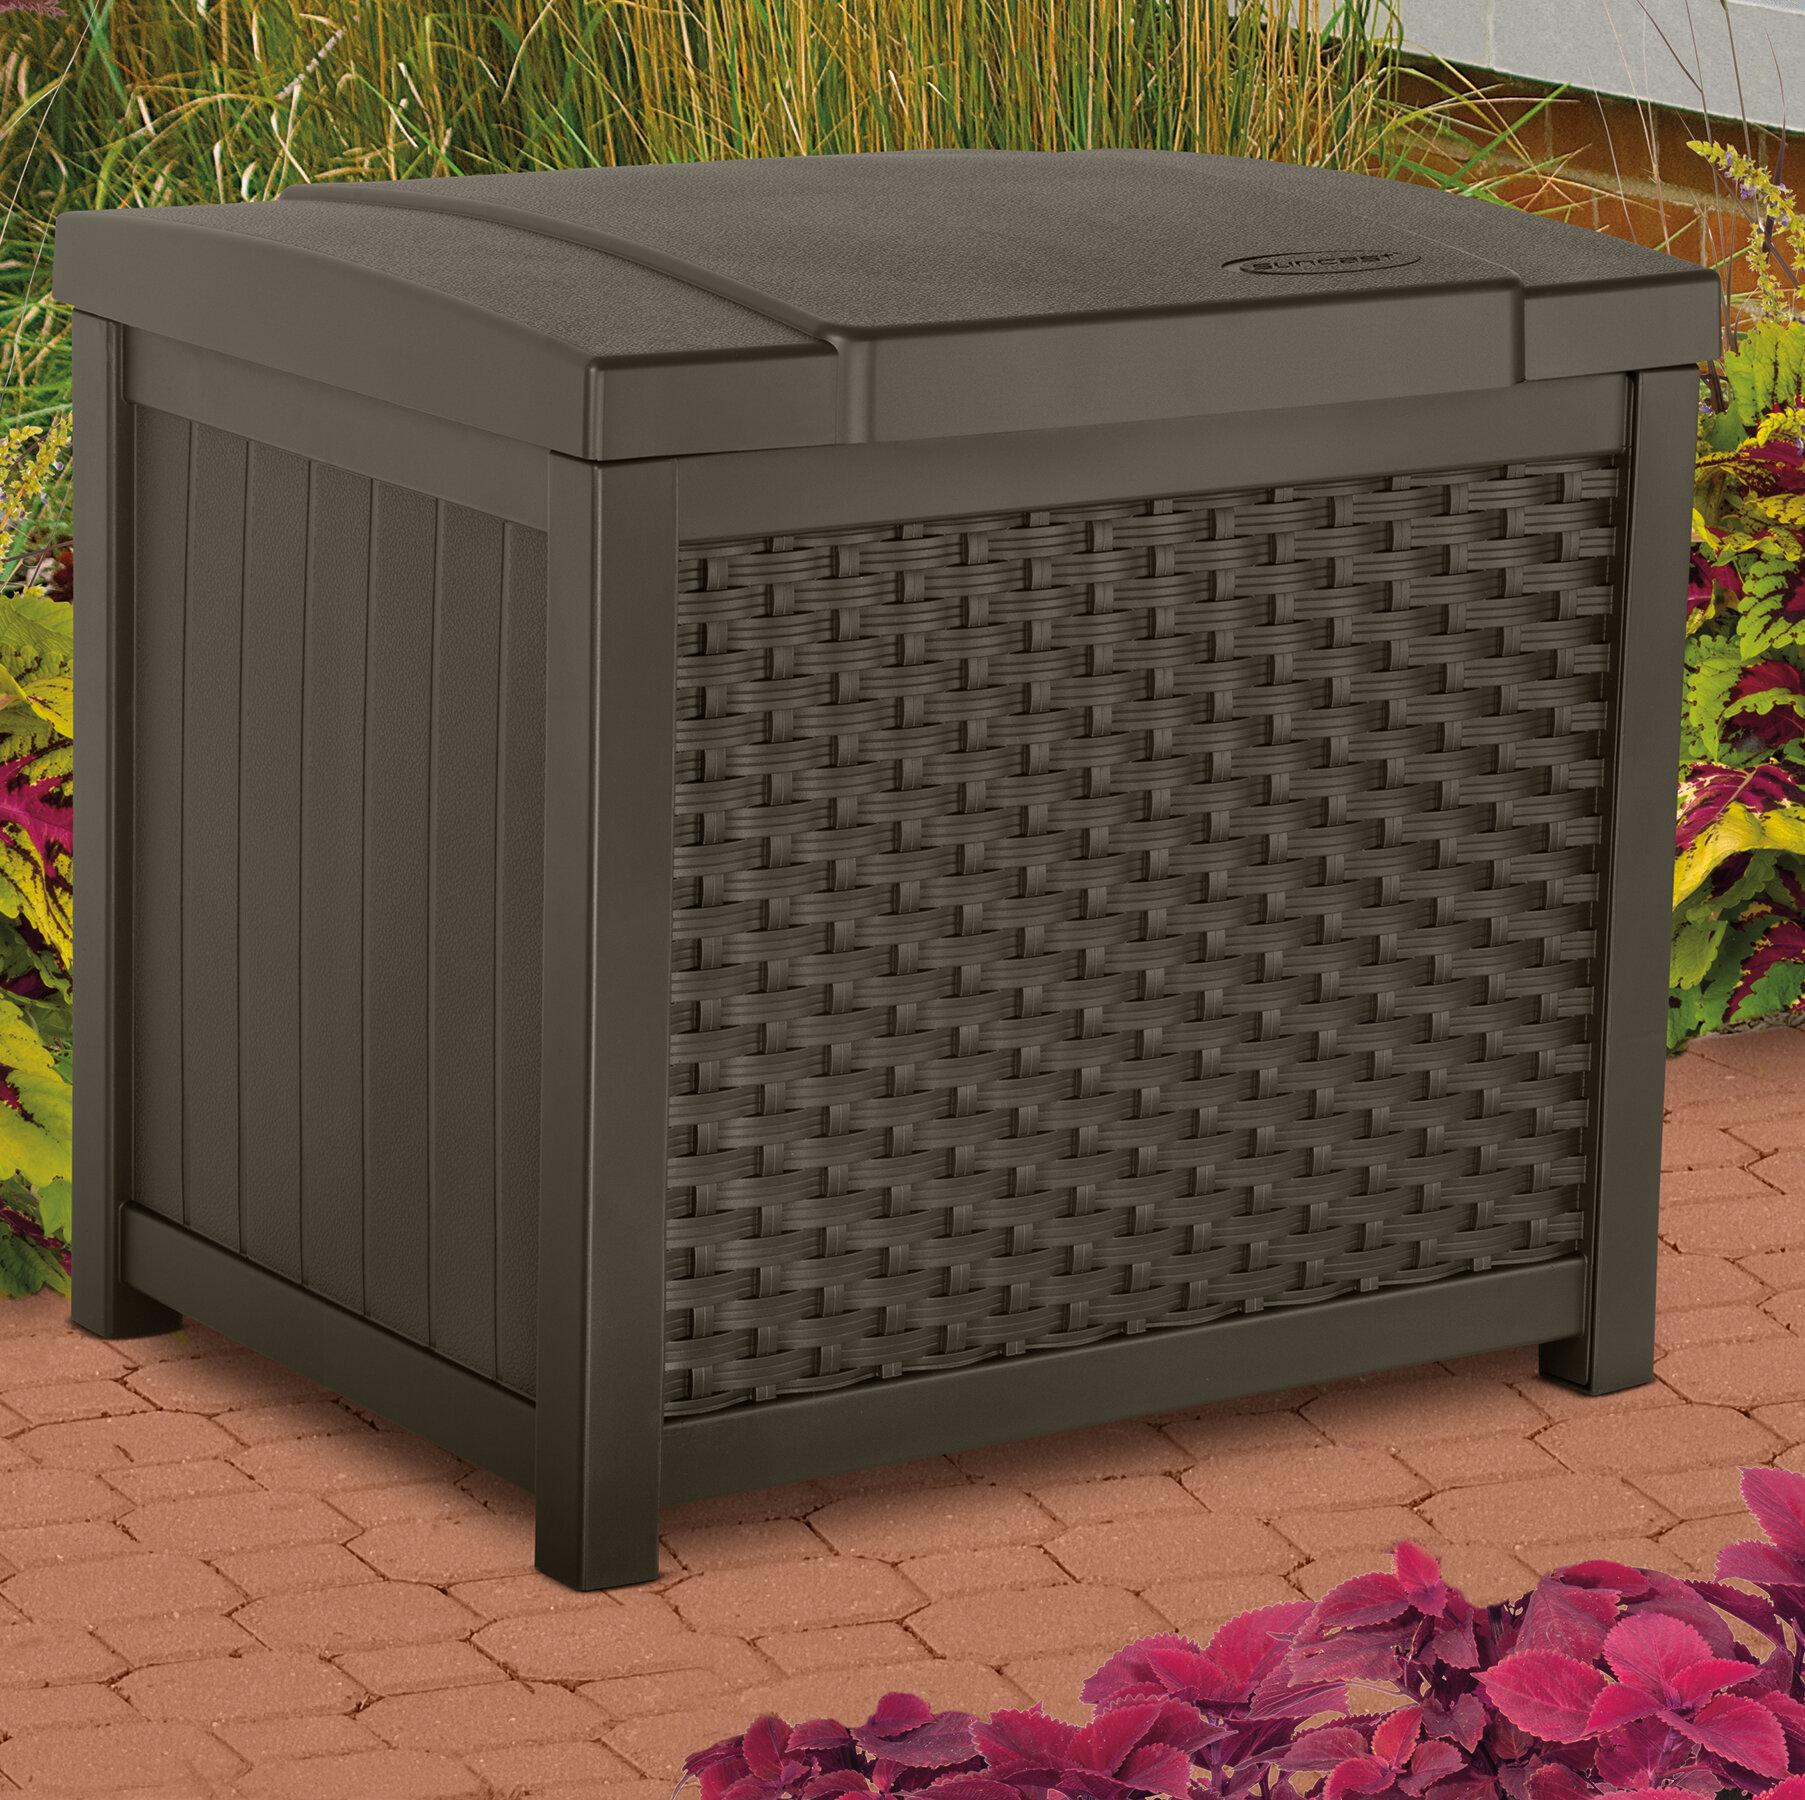 Suncast 22 Gallon Resin Deck Box Reviews Wayfair